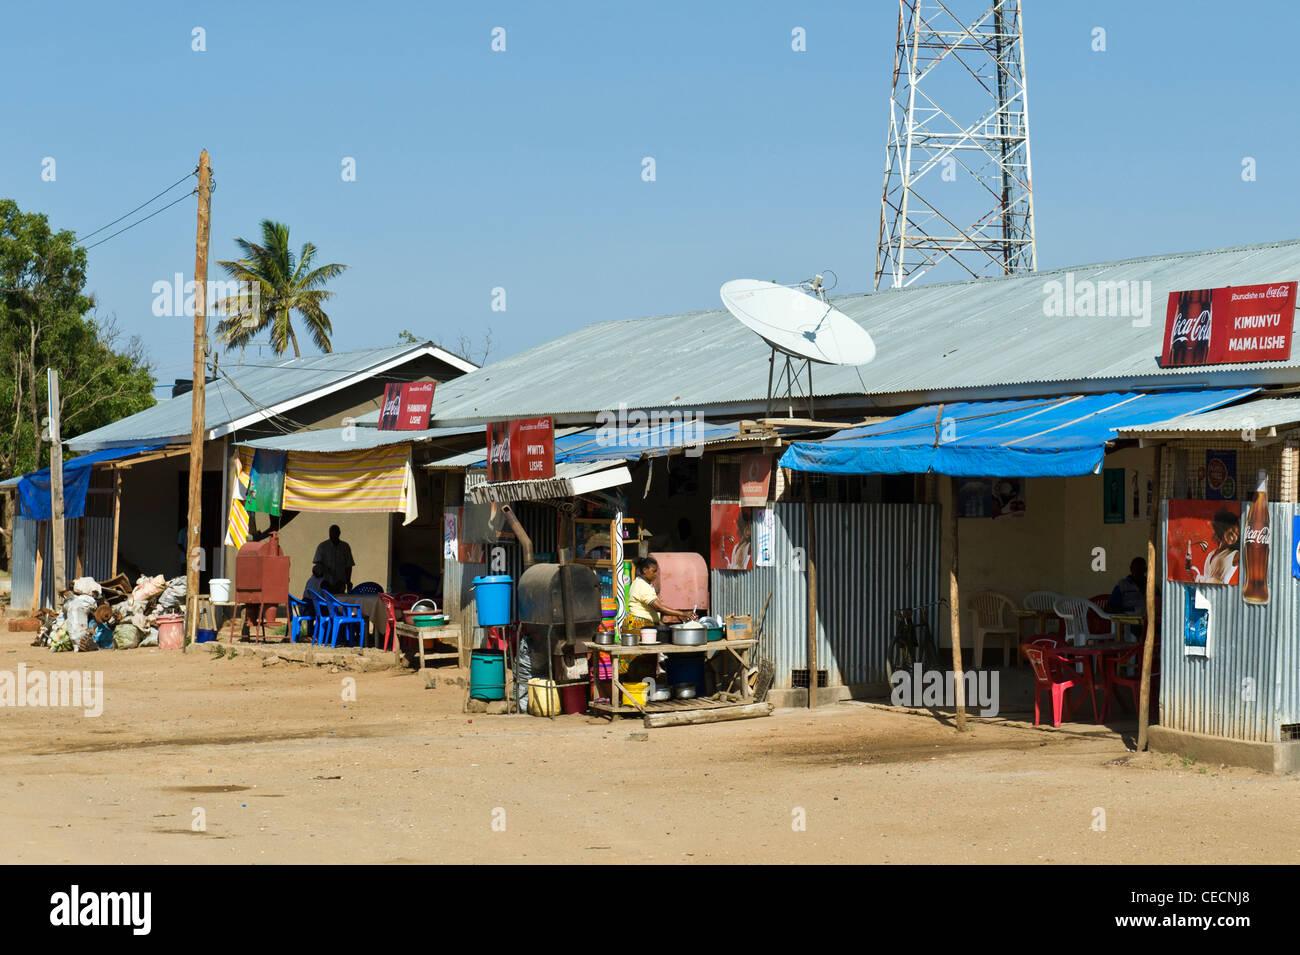 Small restaurant with satellite dish in Same Kilimanjaro Region Tanzania Stock Photo